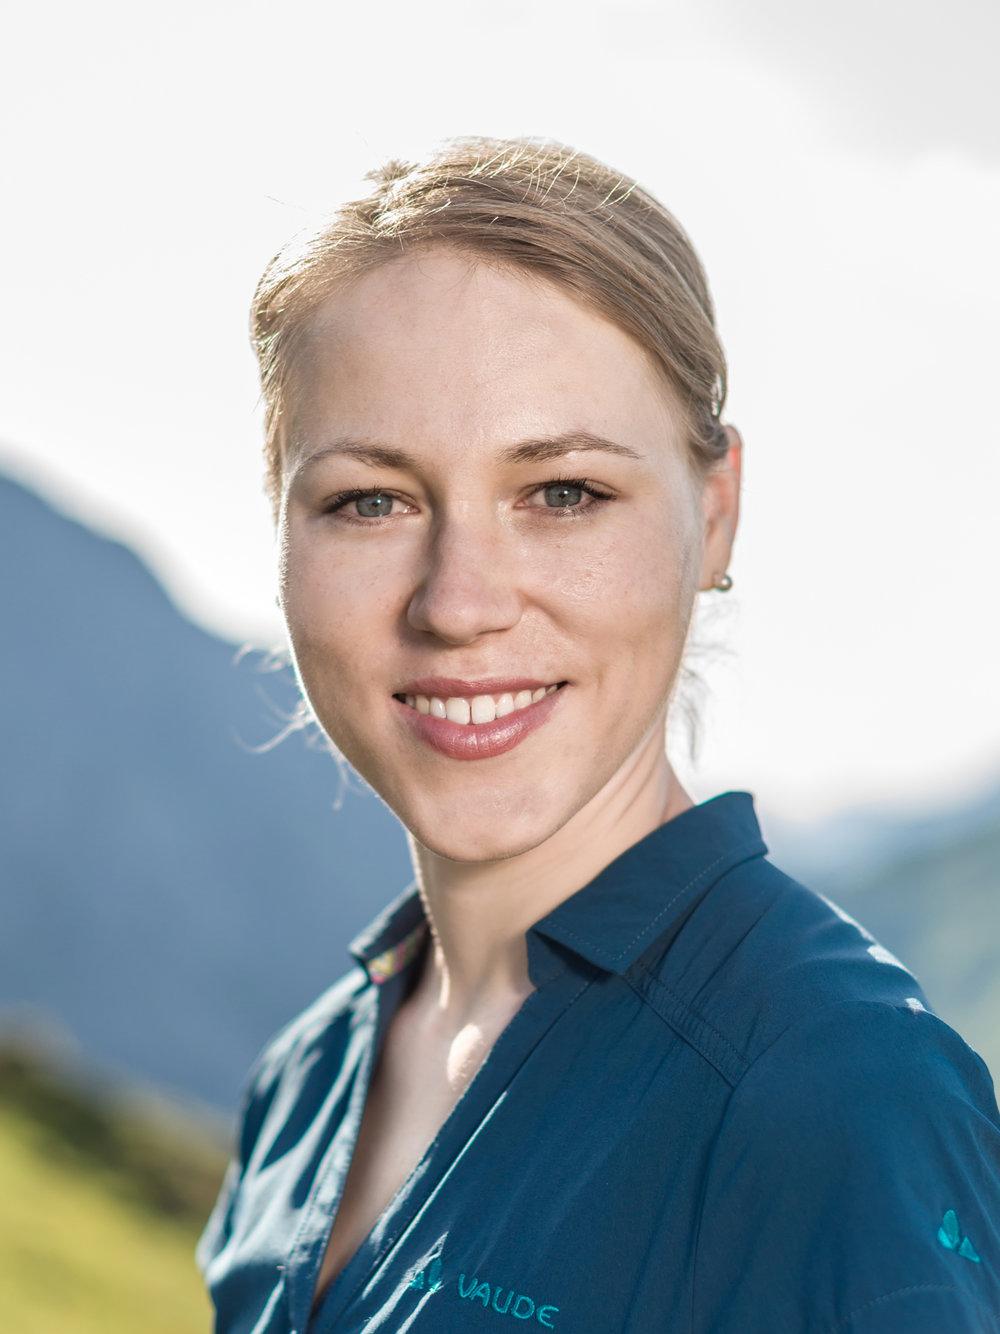 Kerstin-Profilfoto-original-1MB.jpg